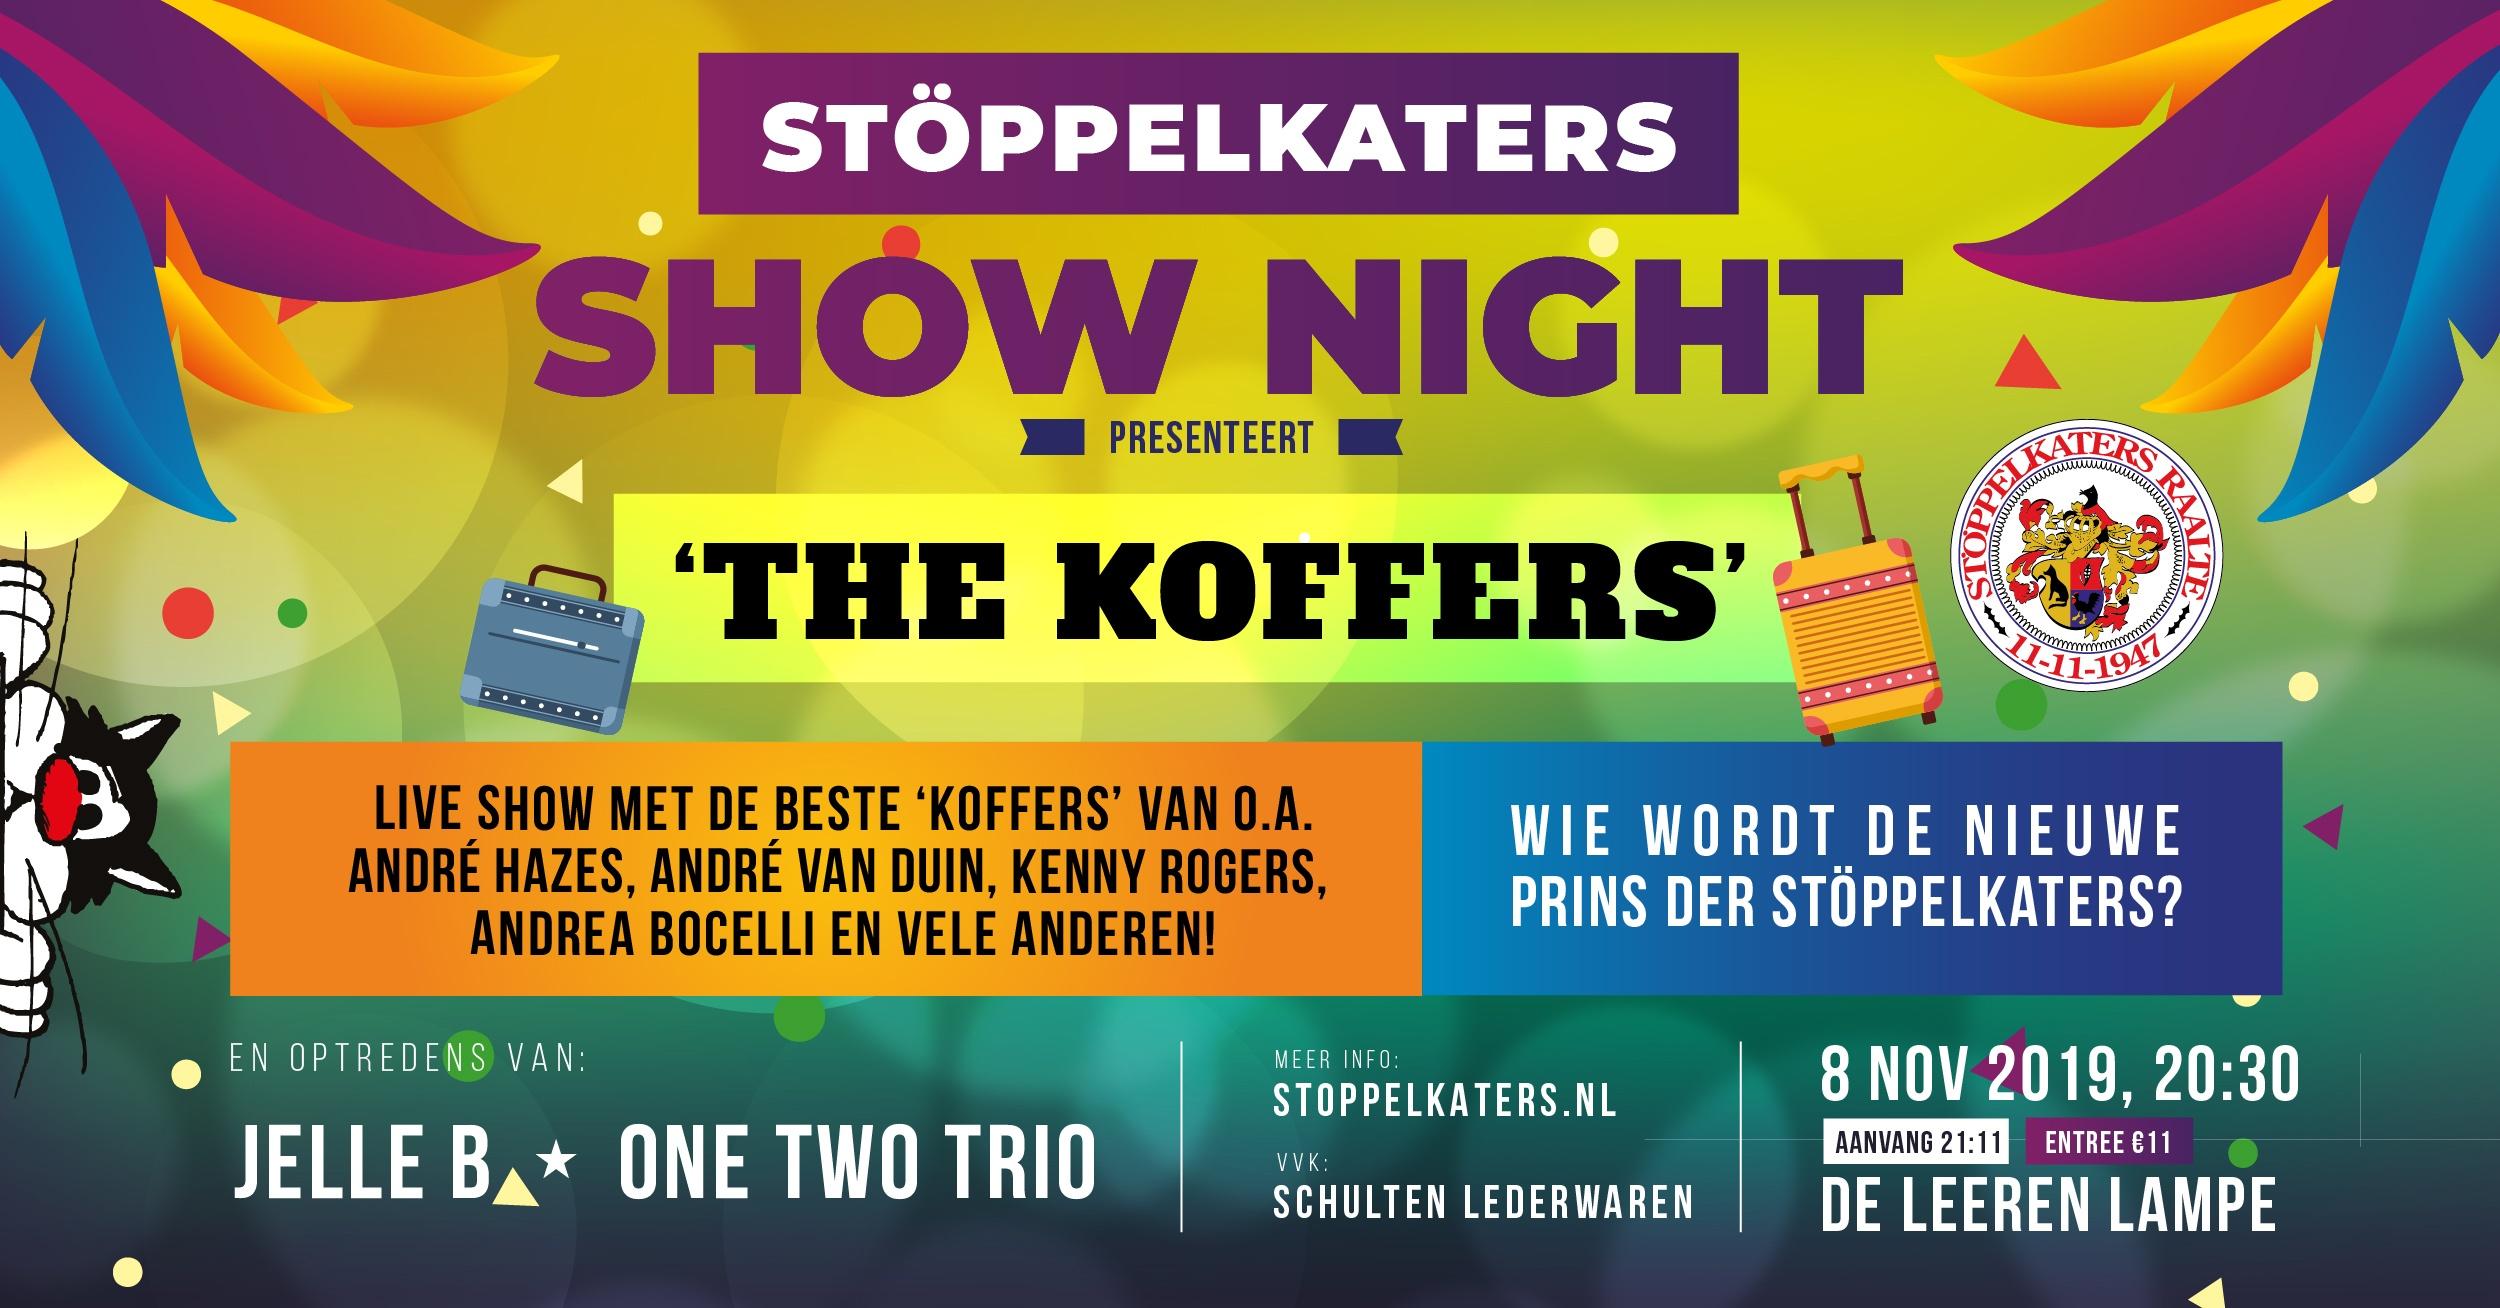 Stöppelkaters Show Night